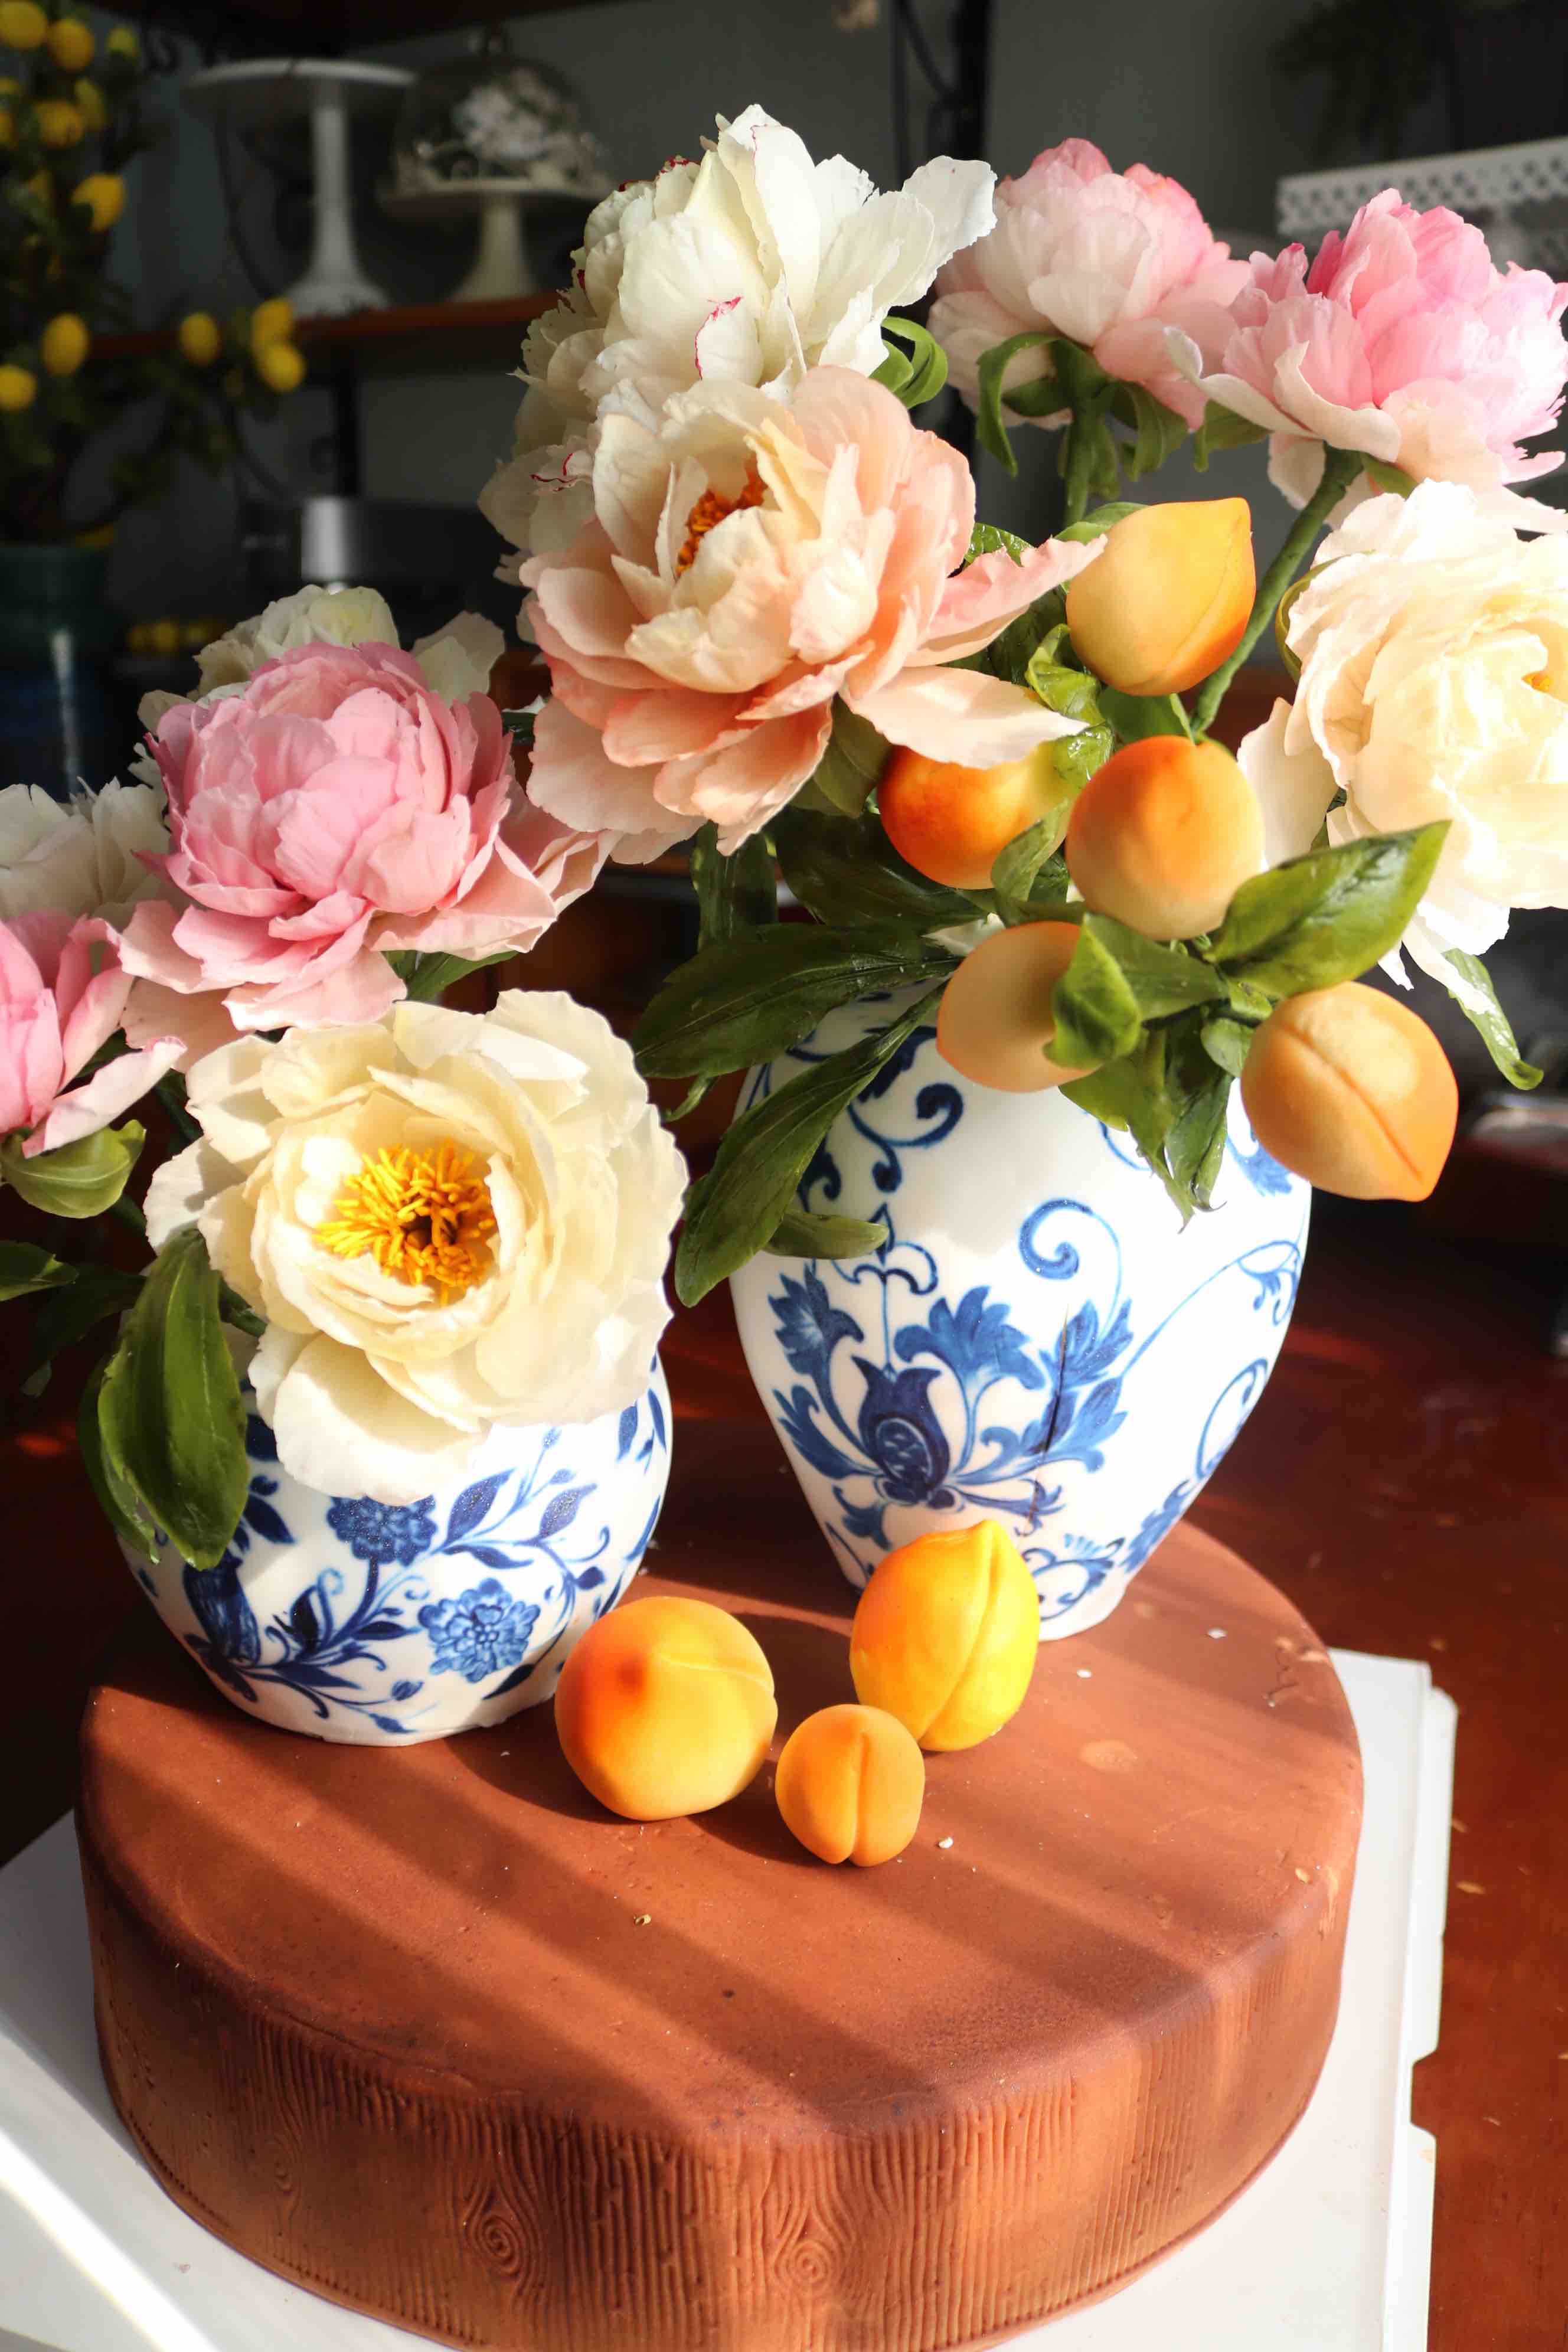 An edible flower vase cake made by Lam Ngoc Tran. Photo: Hoang An / Tuoi Tre